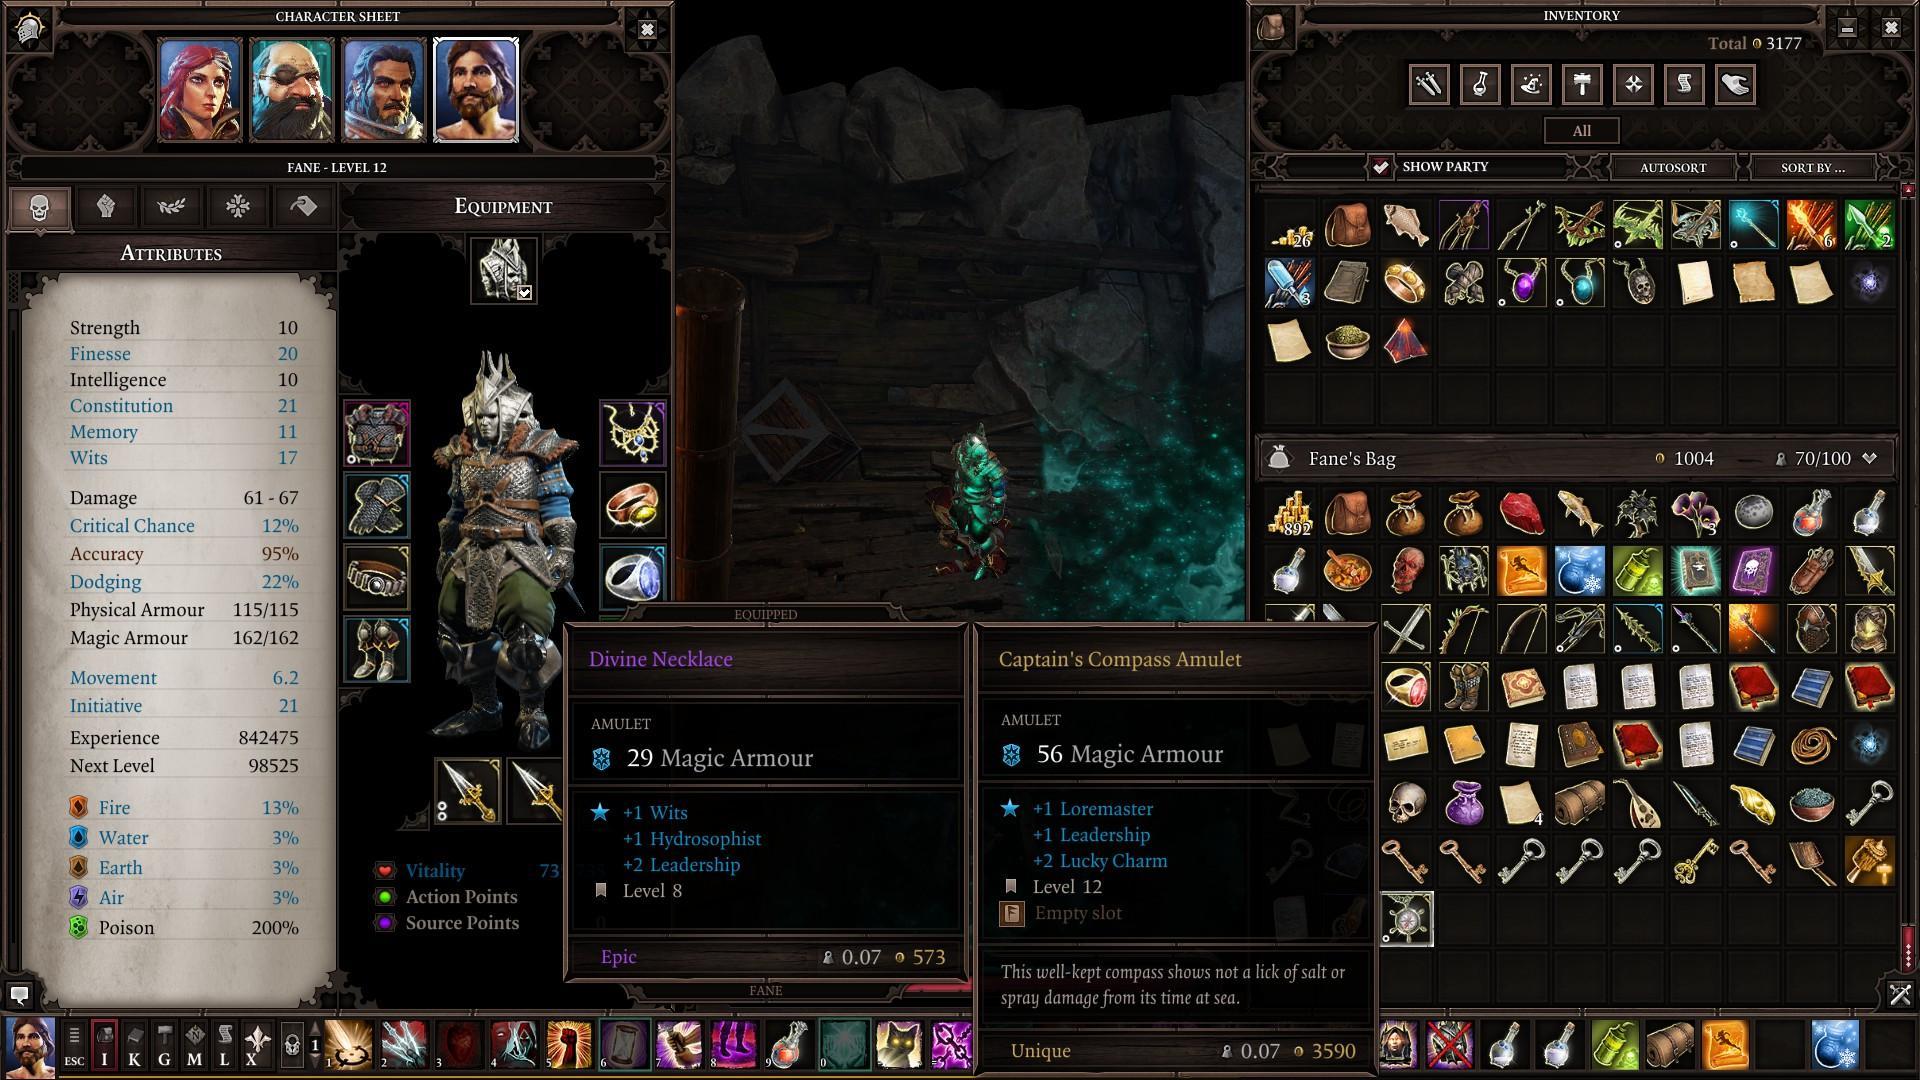 Divinity: Original Sin 2 - Unique Items in the Reaper's Coast